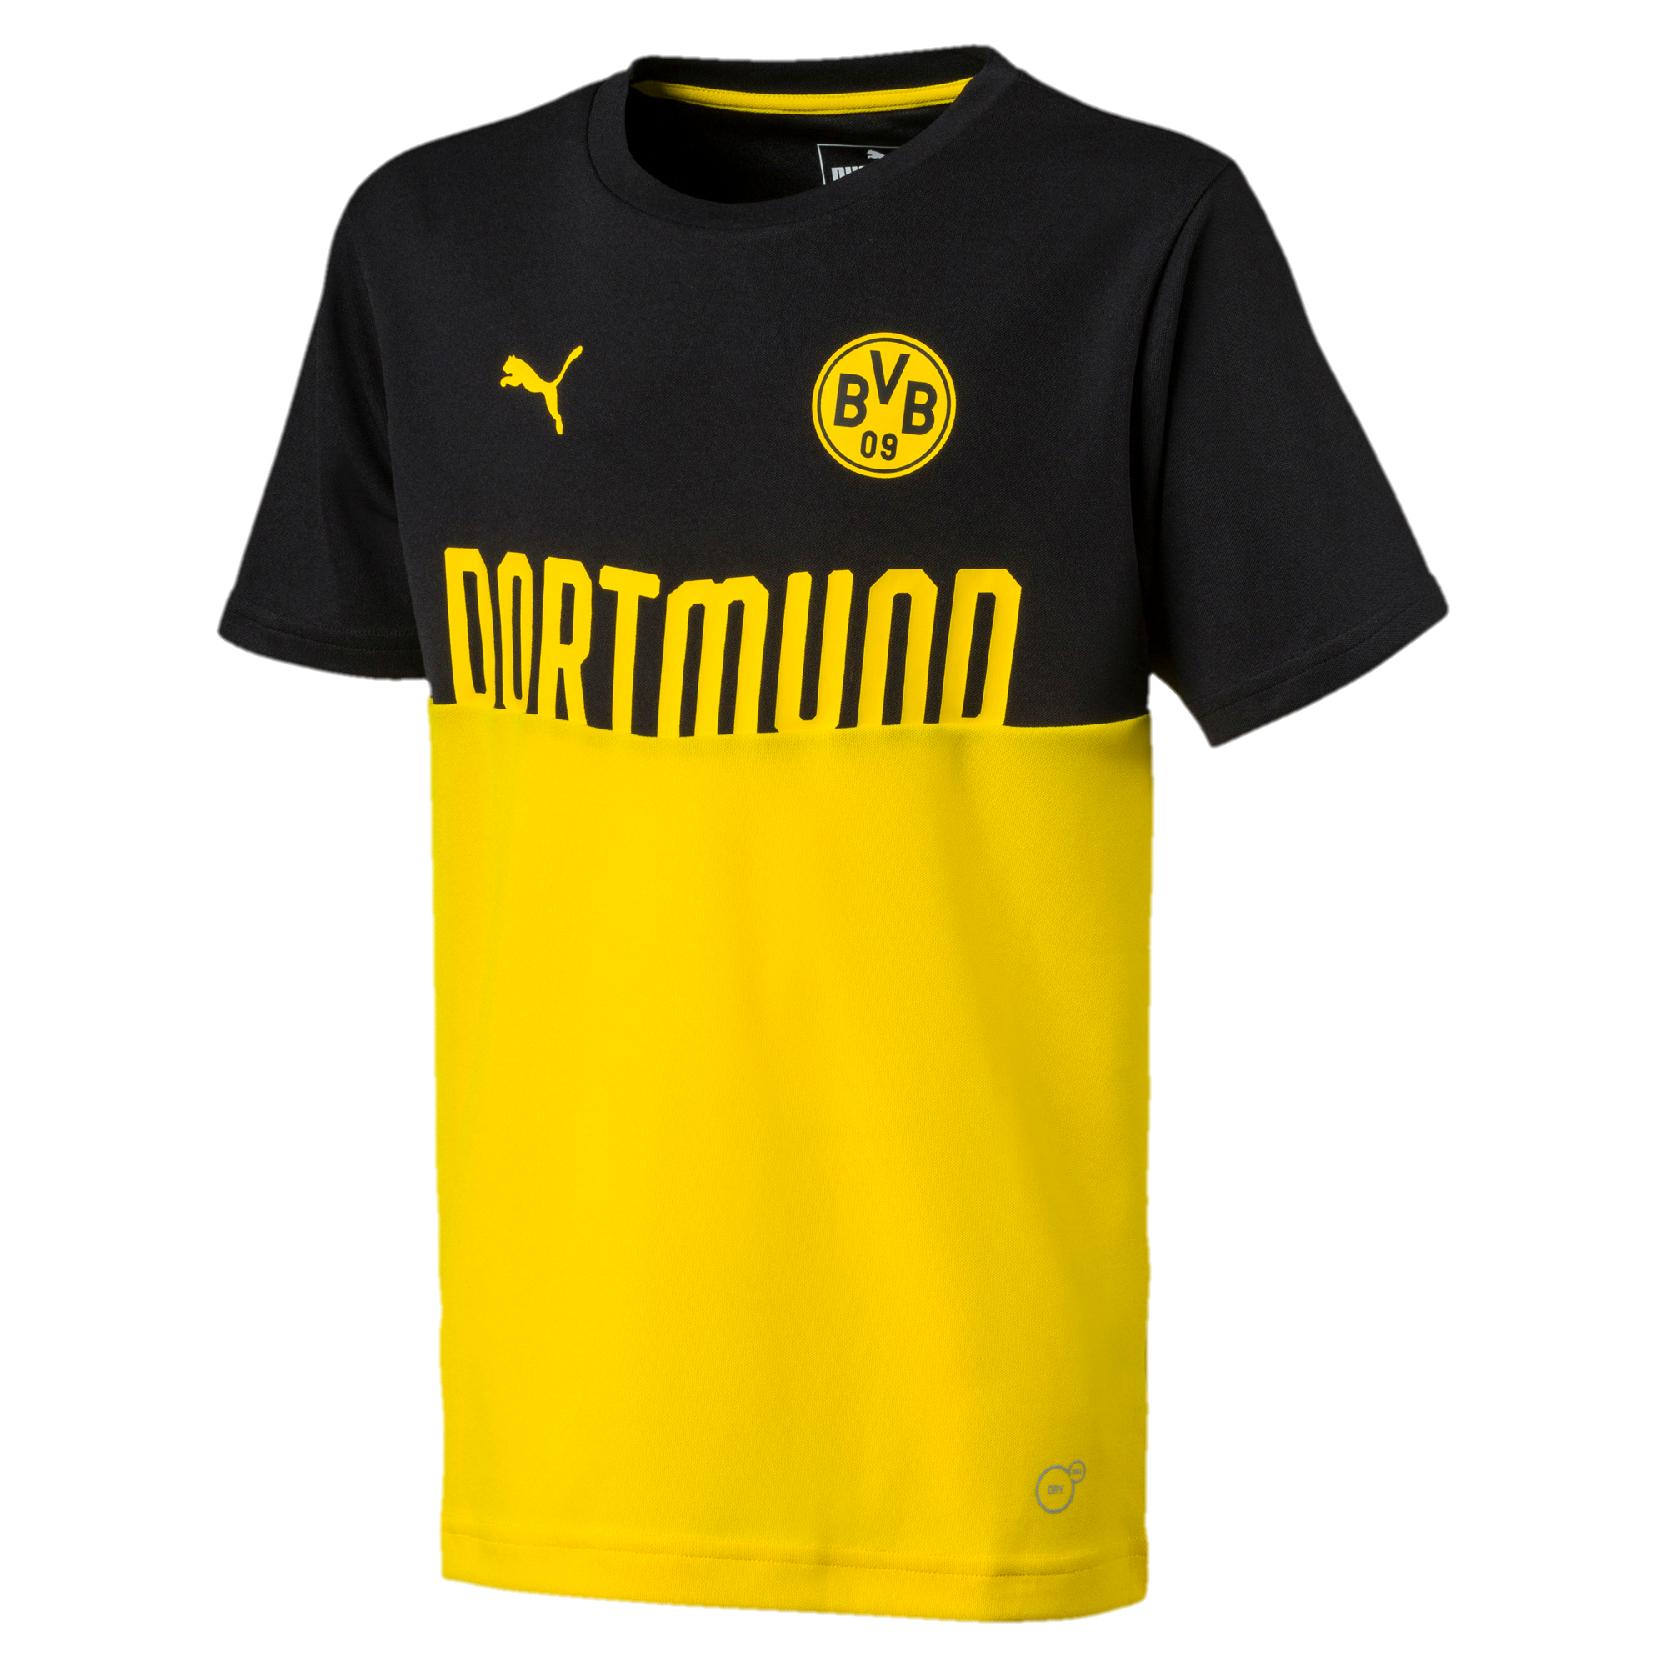 new style 62c66 25771 Puma BVB Borussia Dortmund Kinder Fan T-Shirt Poly Tee Fußball Shirt -  754102-02 gelb/schwarz